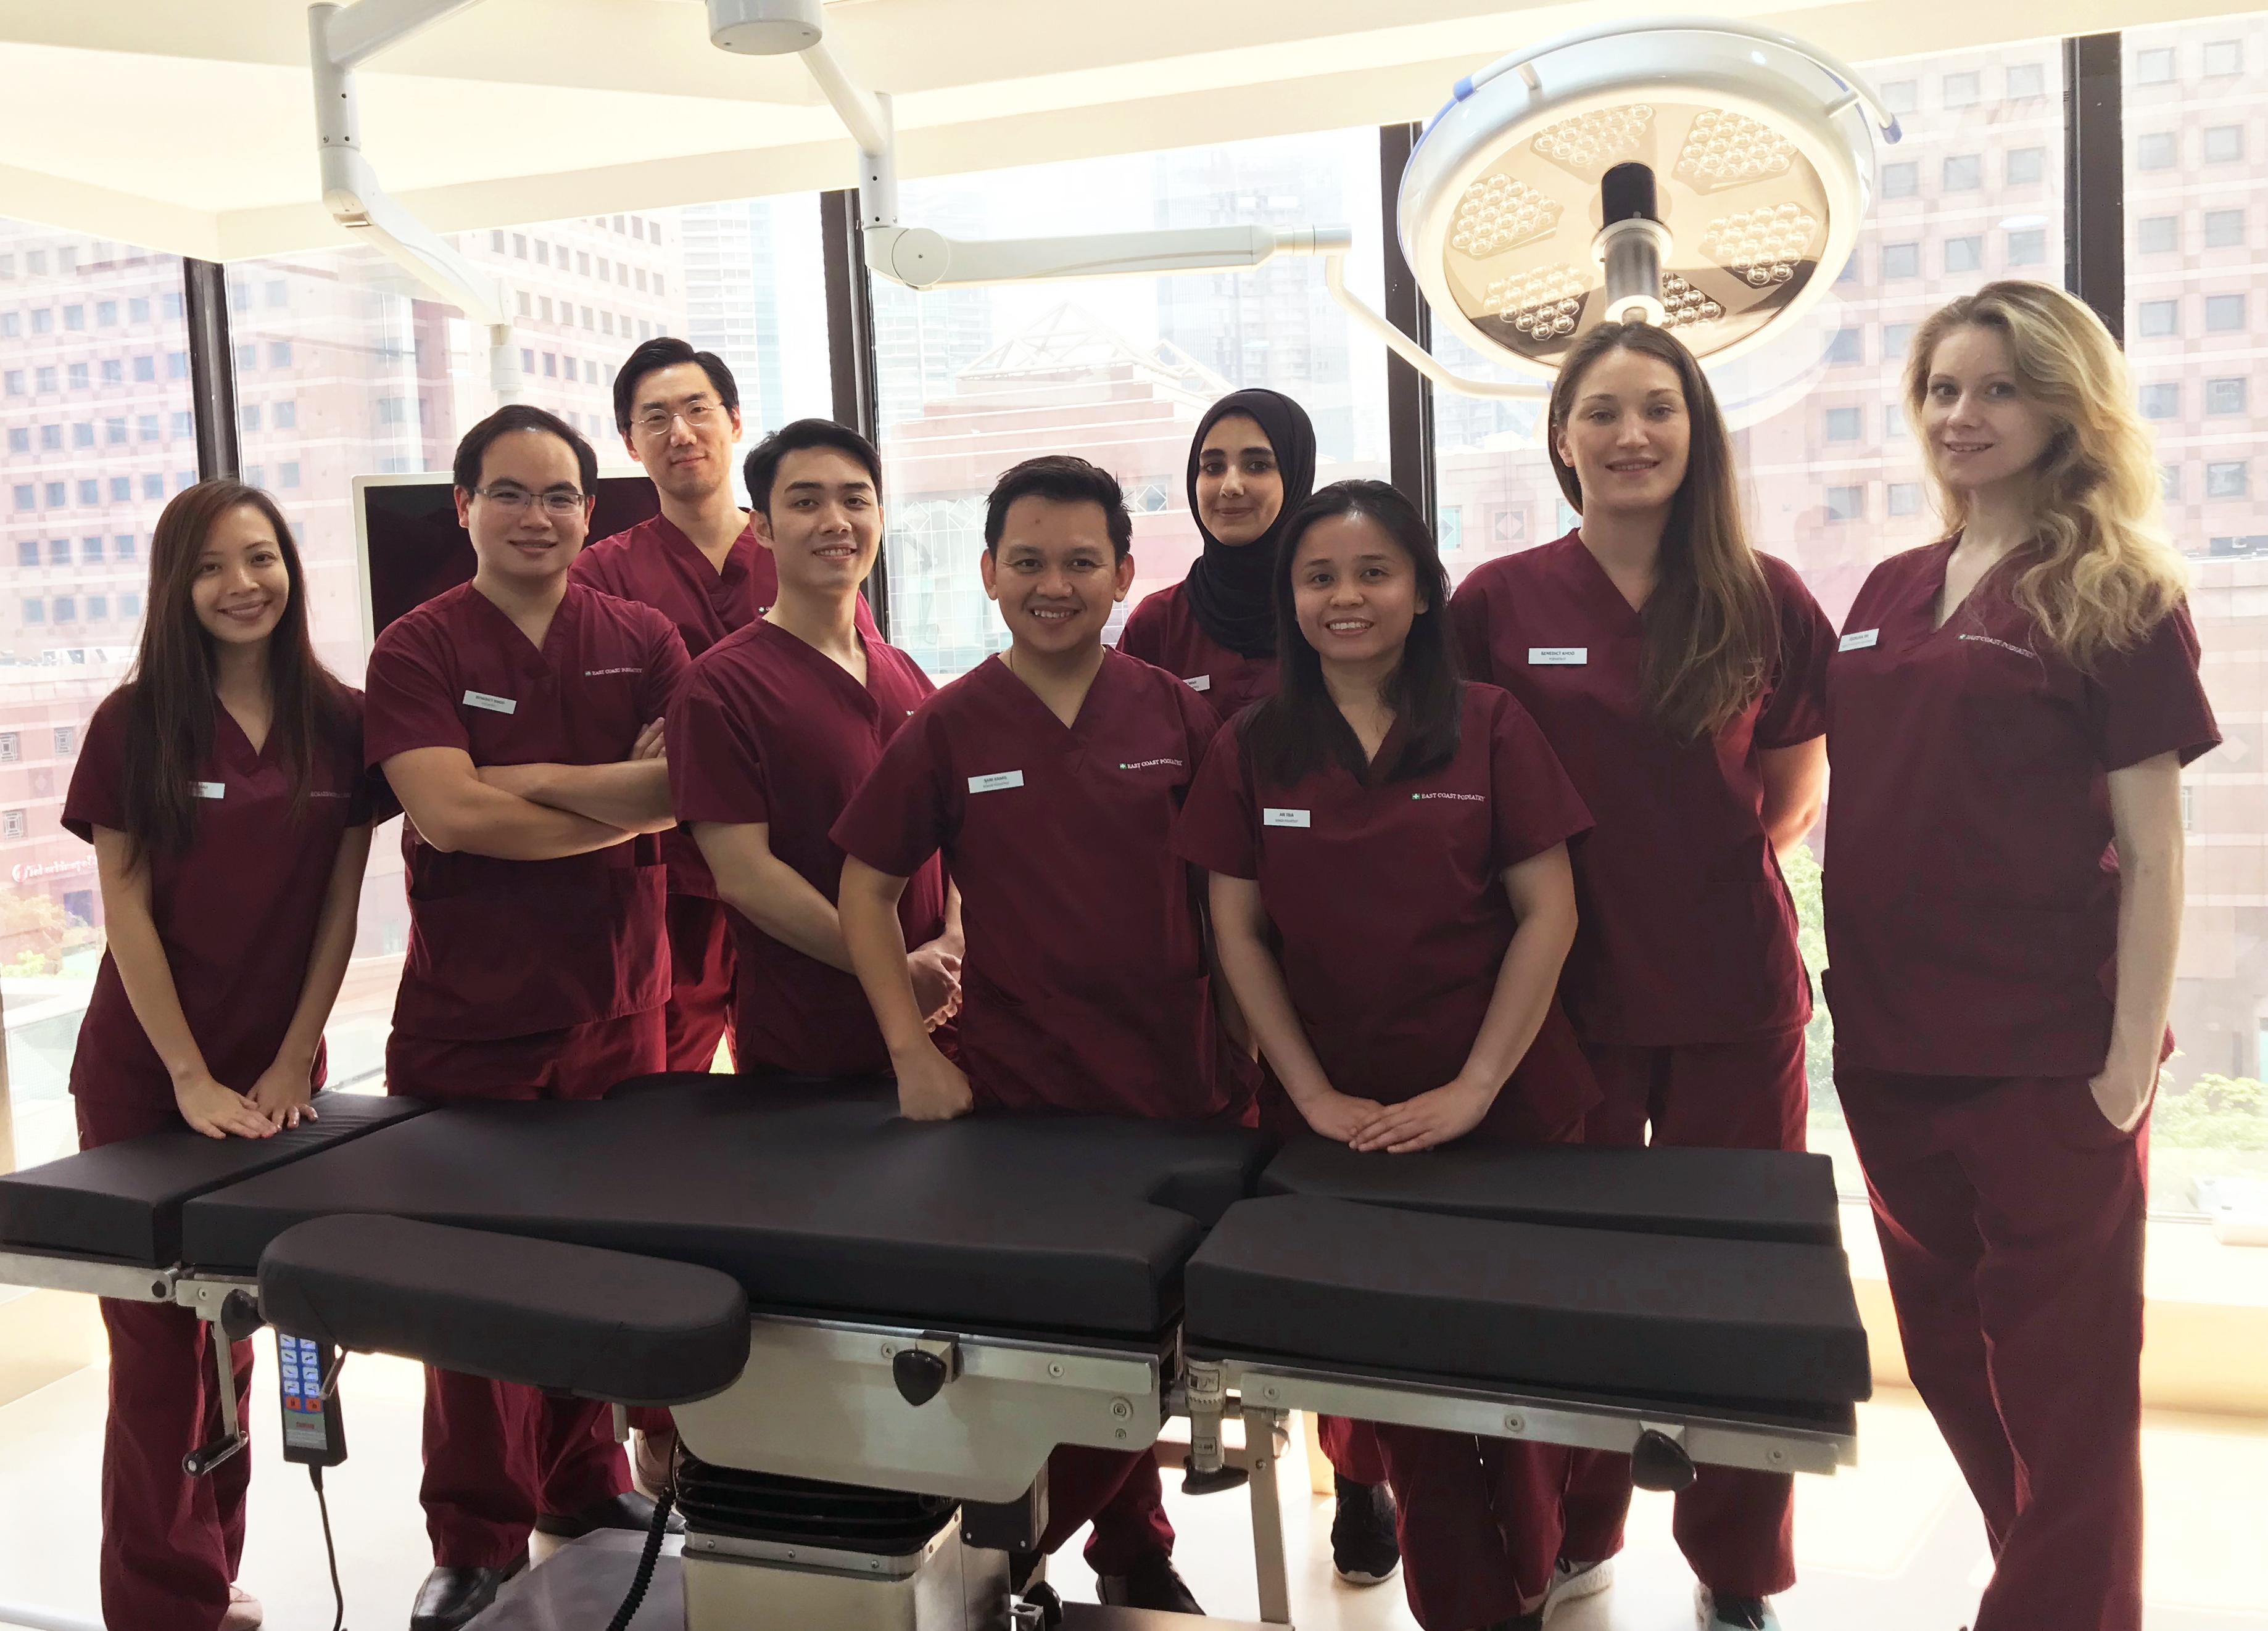 Podiatrist Career | East Coast Podiatry